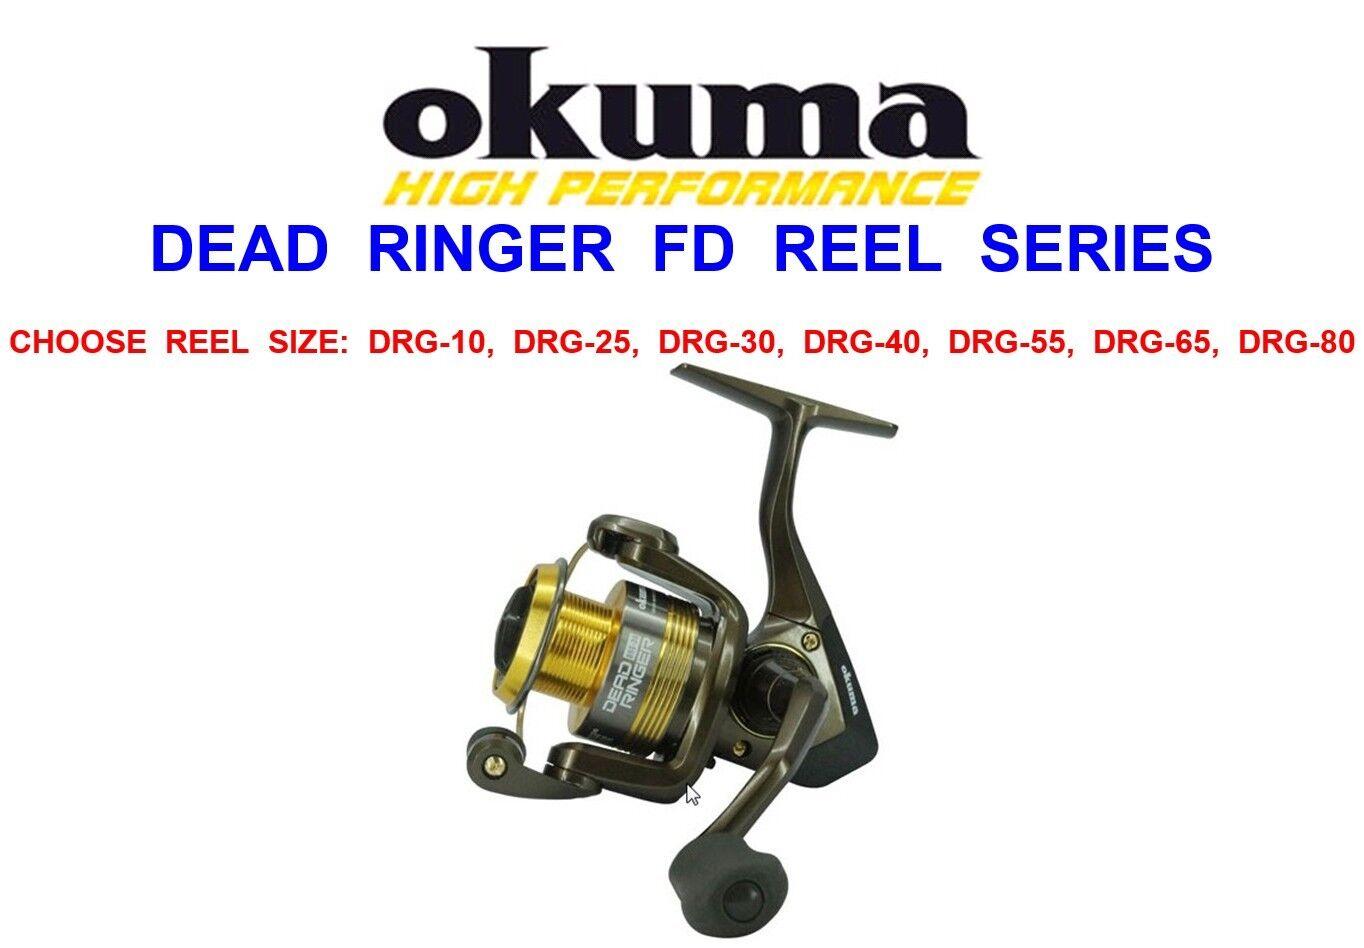 DRG-40 DRG-25 DRG-30 Okuma carbontex drag DEAD RINGER DRG-10